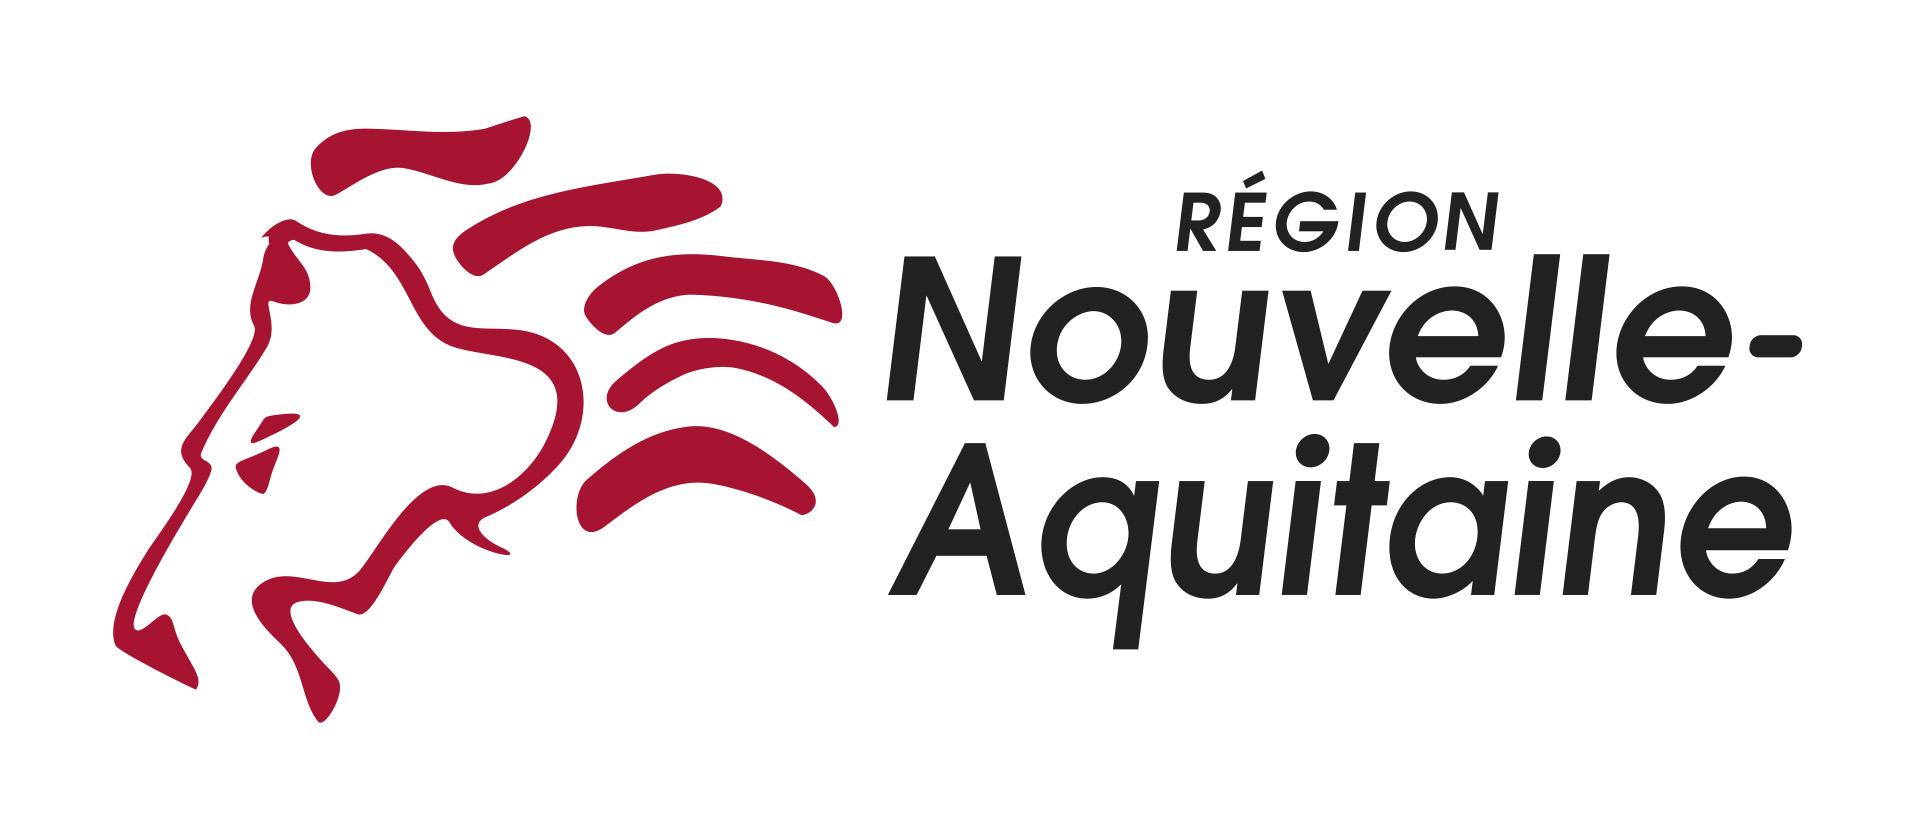 Nouvelle Aquitaine Region logo